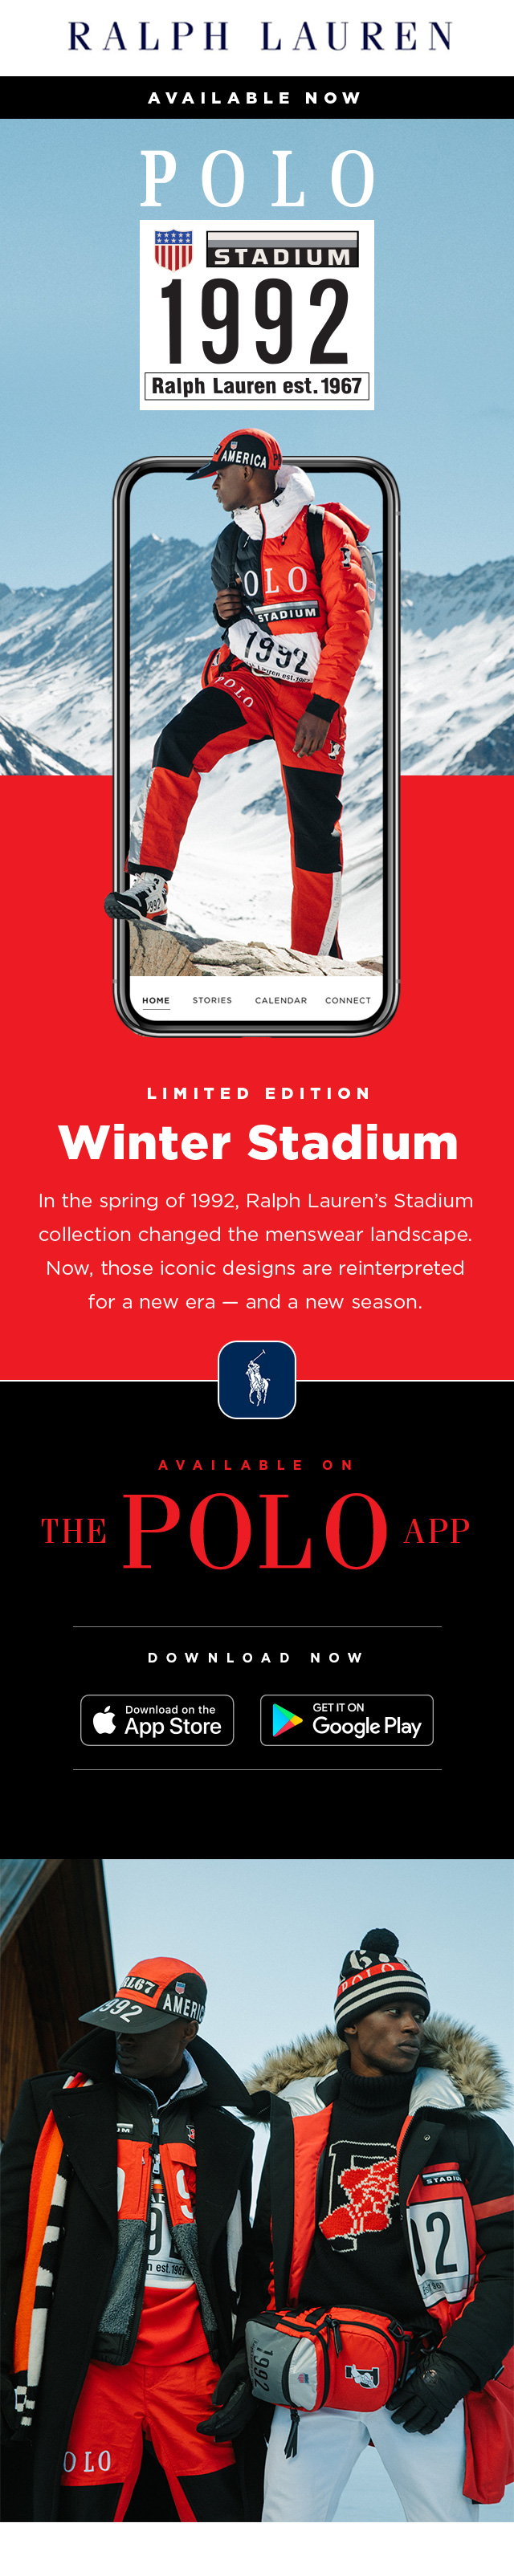 Polo Winter Stadium.jpg